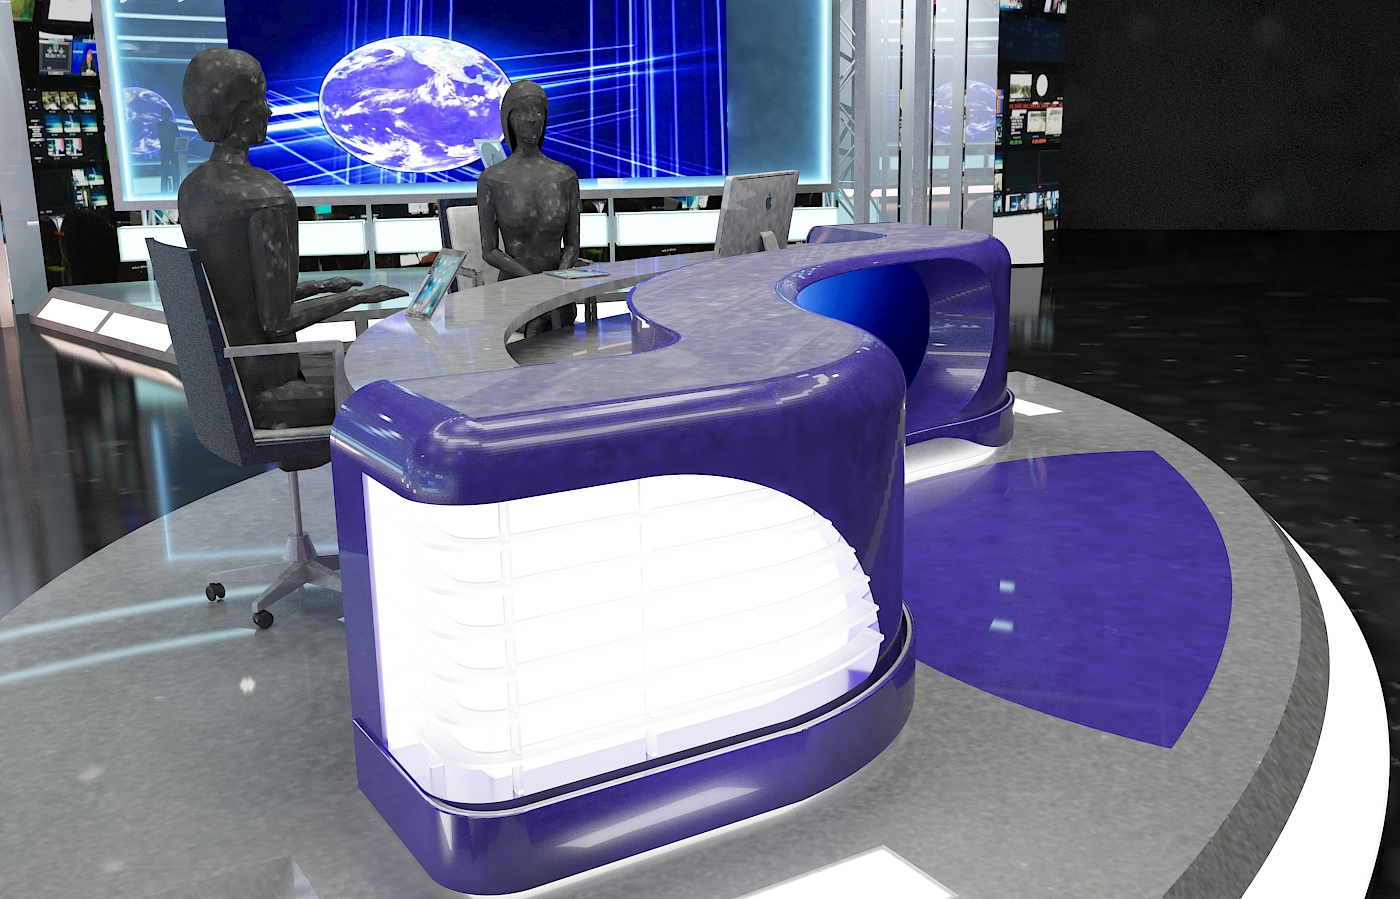 виртуал телевизийн студи цуглуулга vol 6 3d загвар max dxf dwg fbx obj 223378